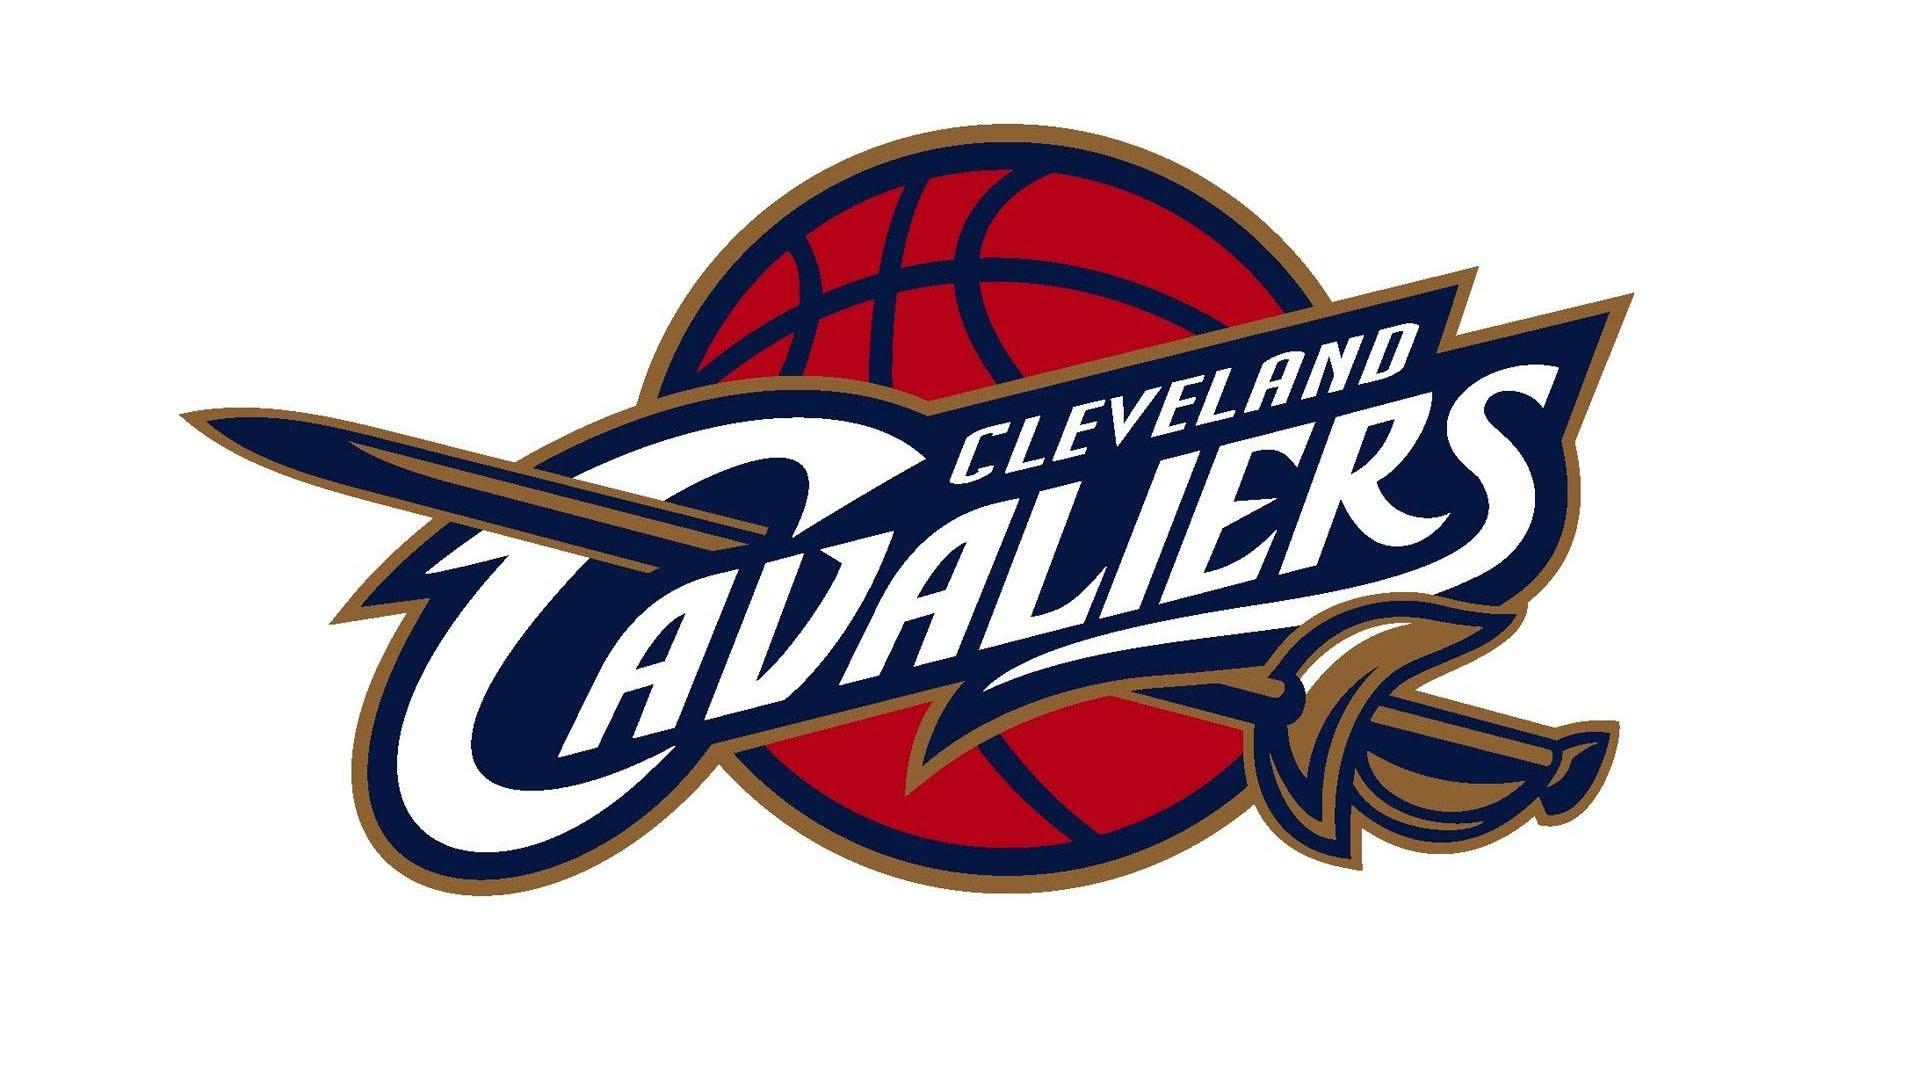 NBA Cleveland Cavaliers Logo wallpaper